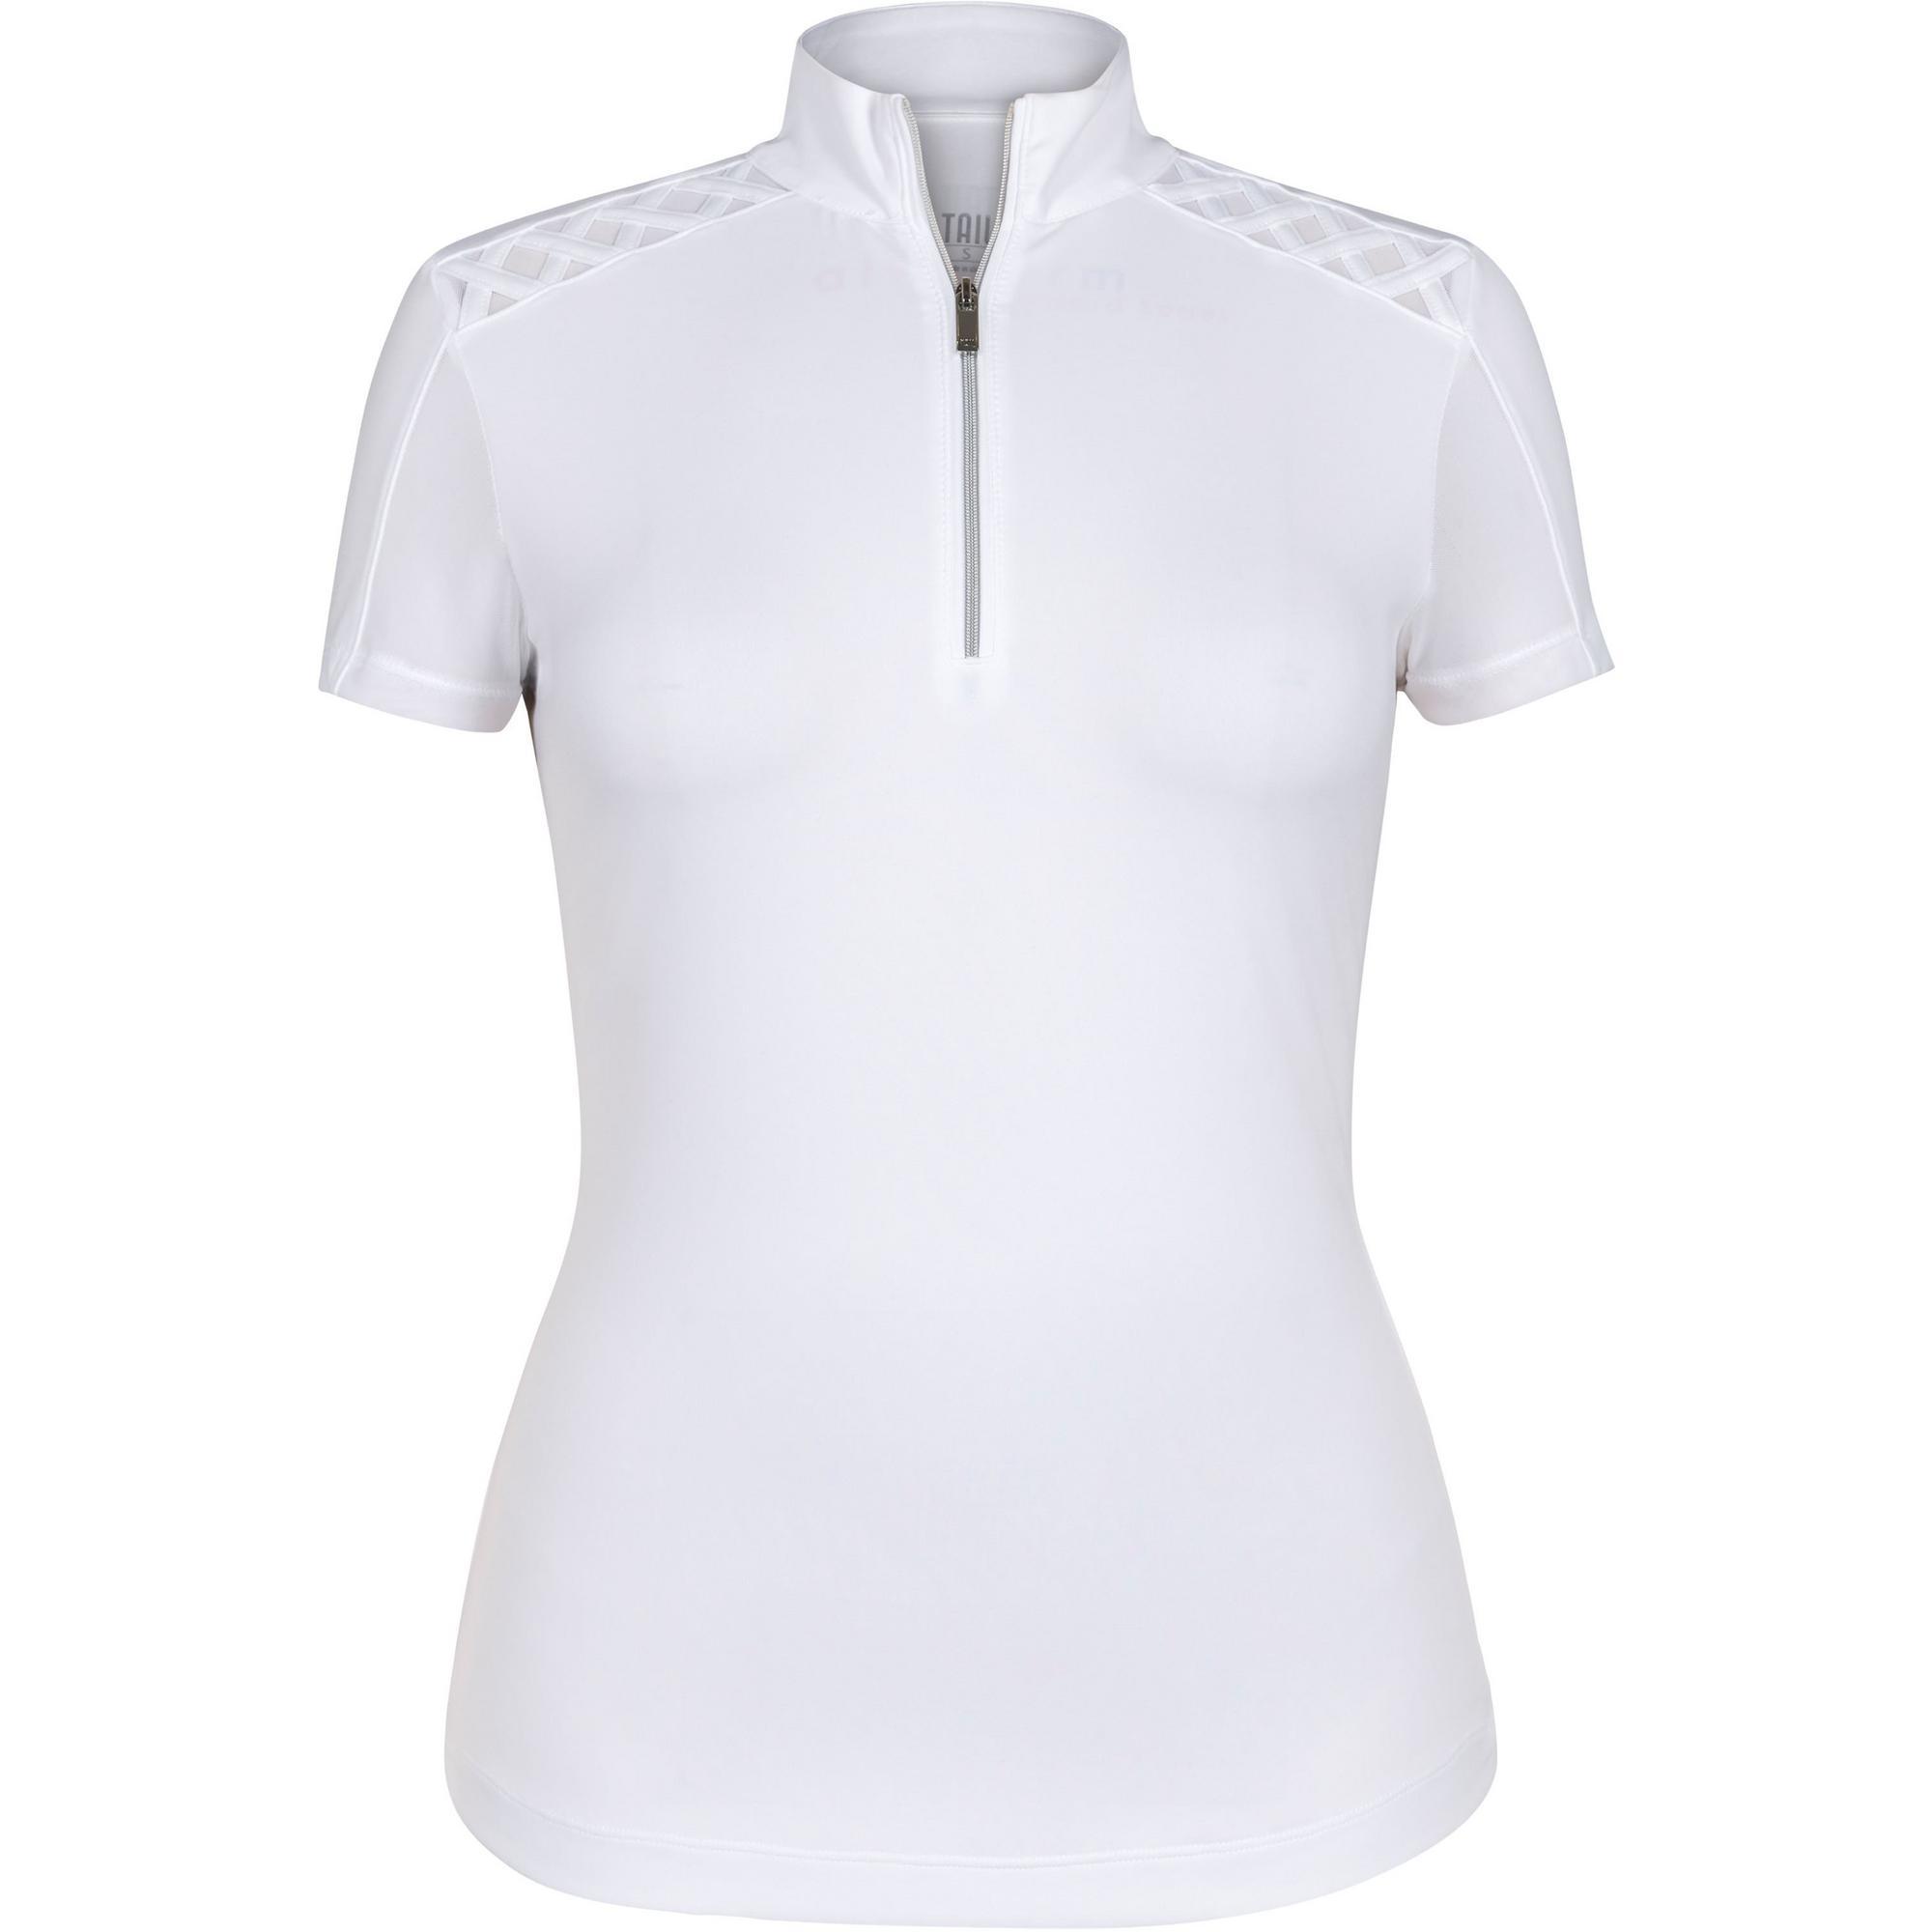 Women's Maui Short Sleeve Polo